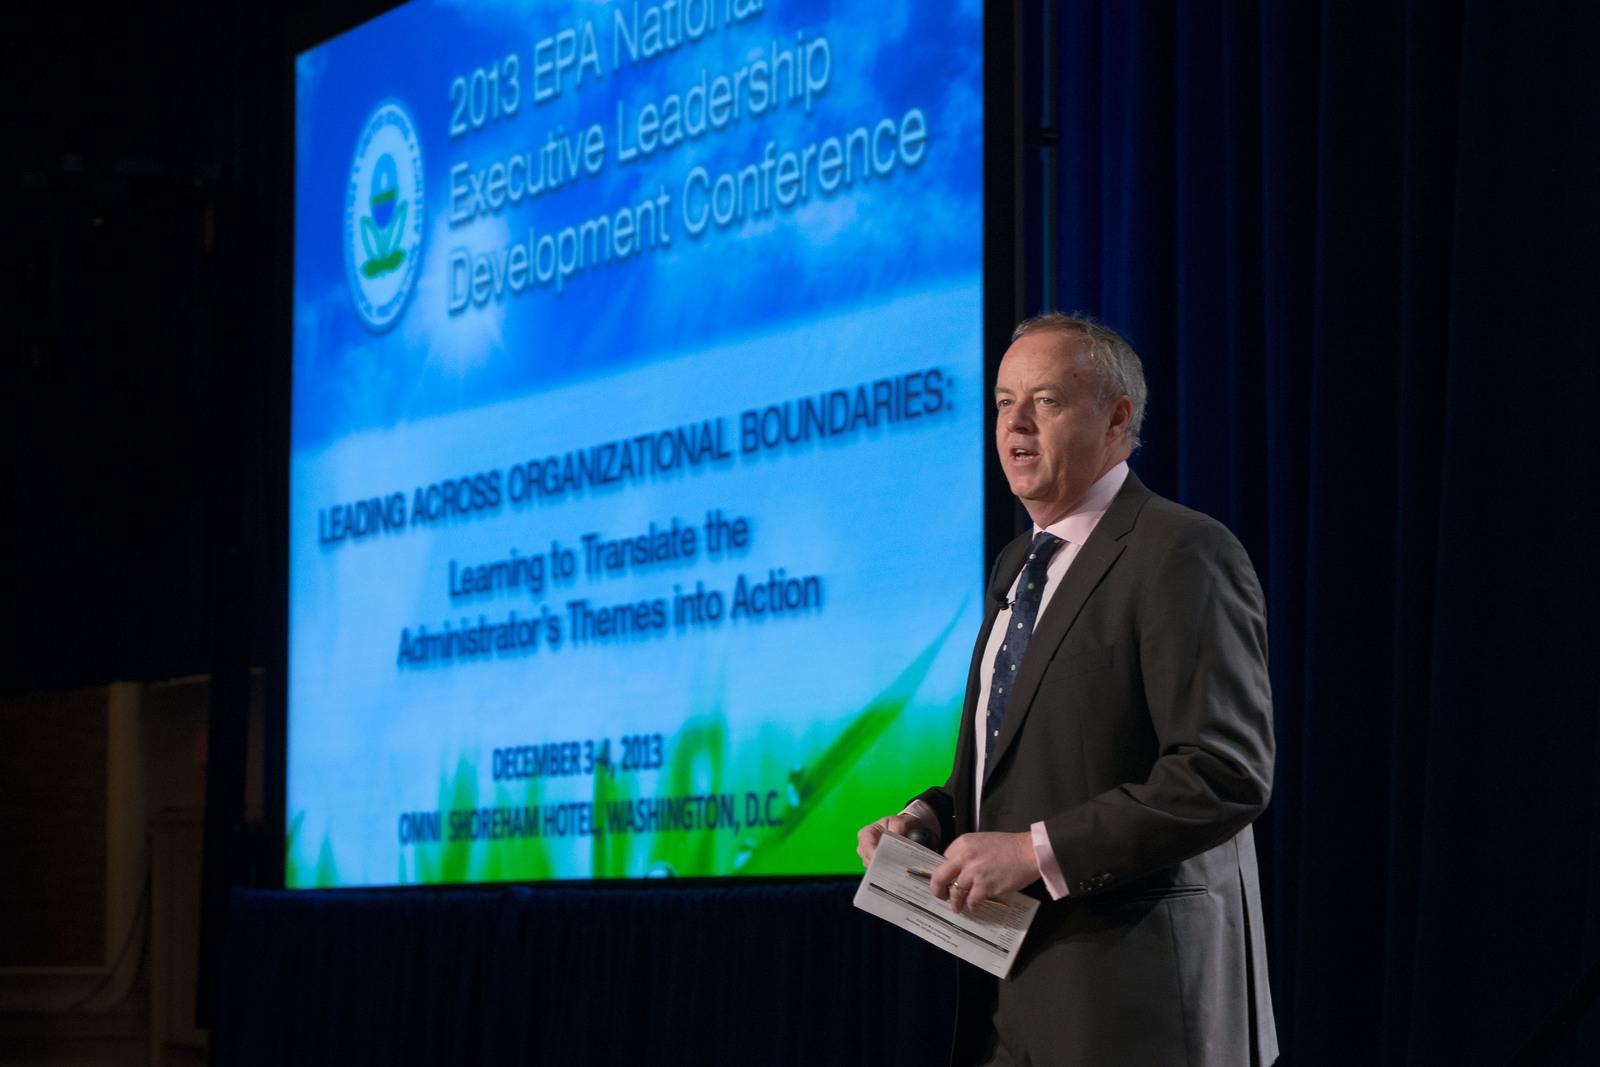 Office of the Administrator - EPA National Executive Leadership Development Conference [412-APD-1169-2013-12-03_ELDC_004.jpg]